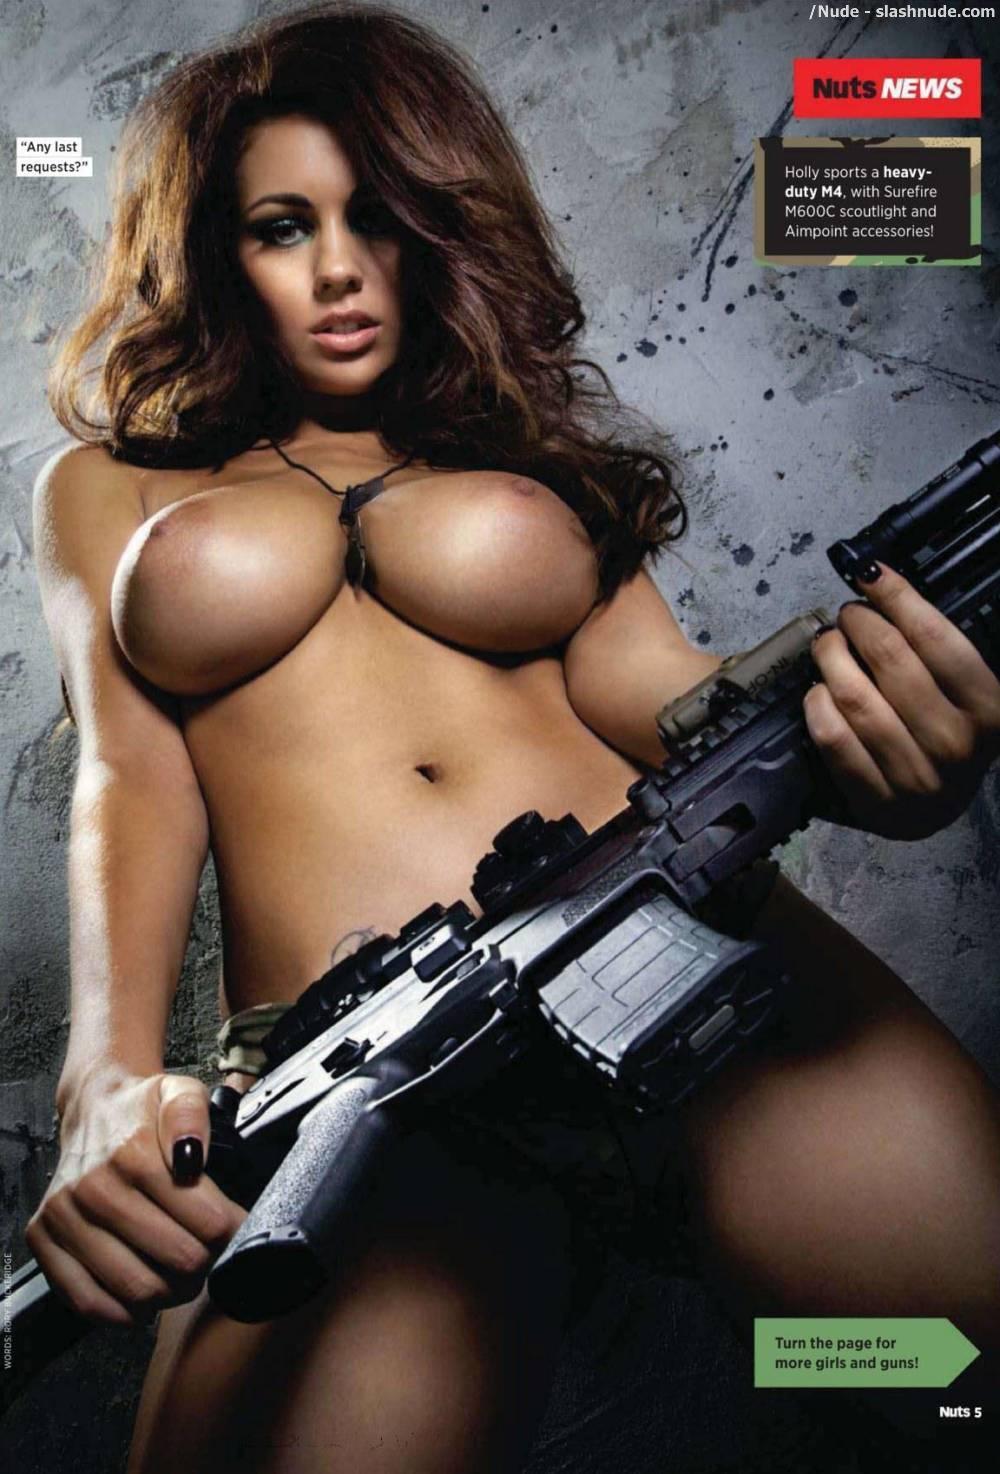 Shooting Guns Topless